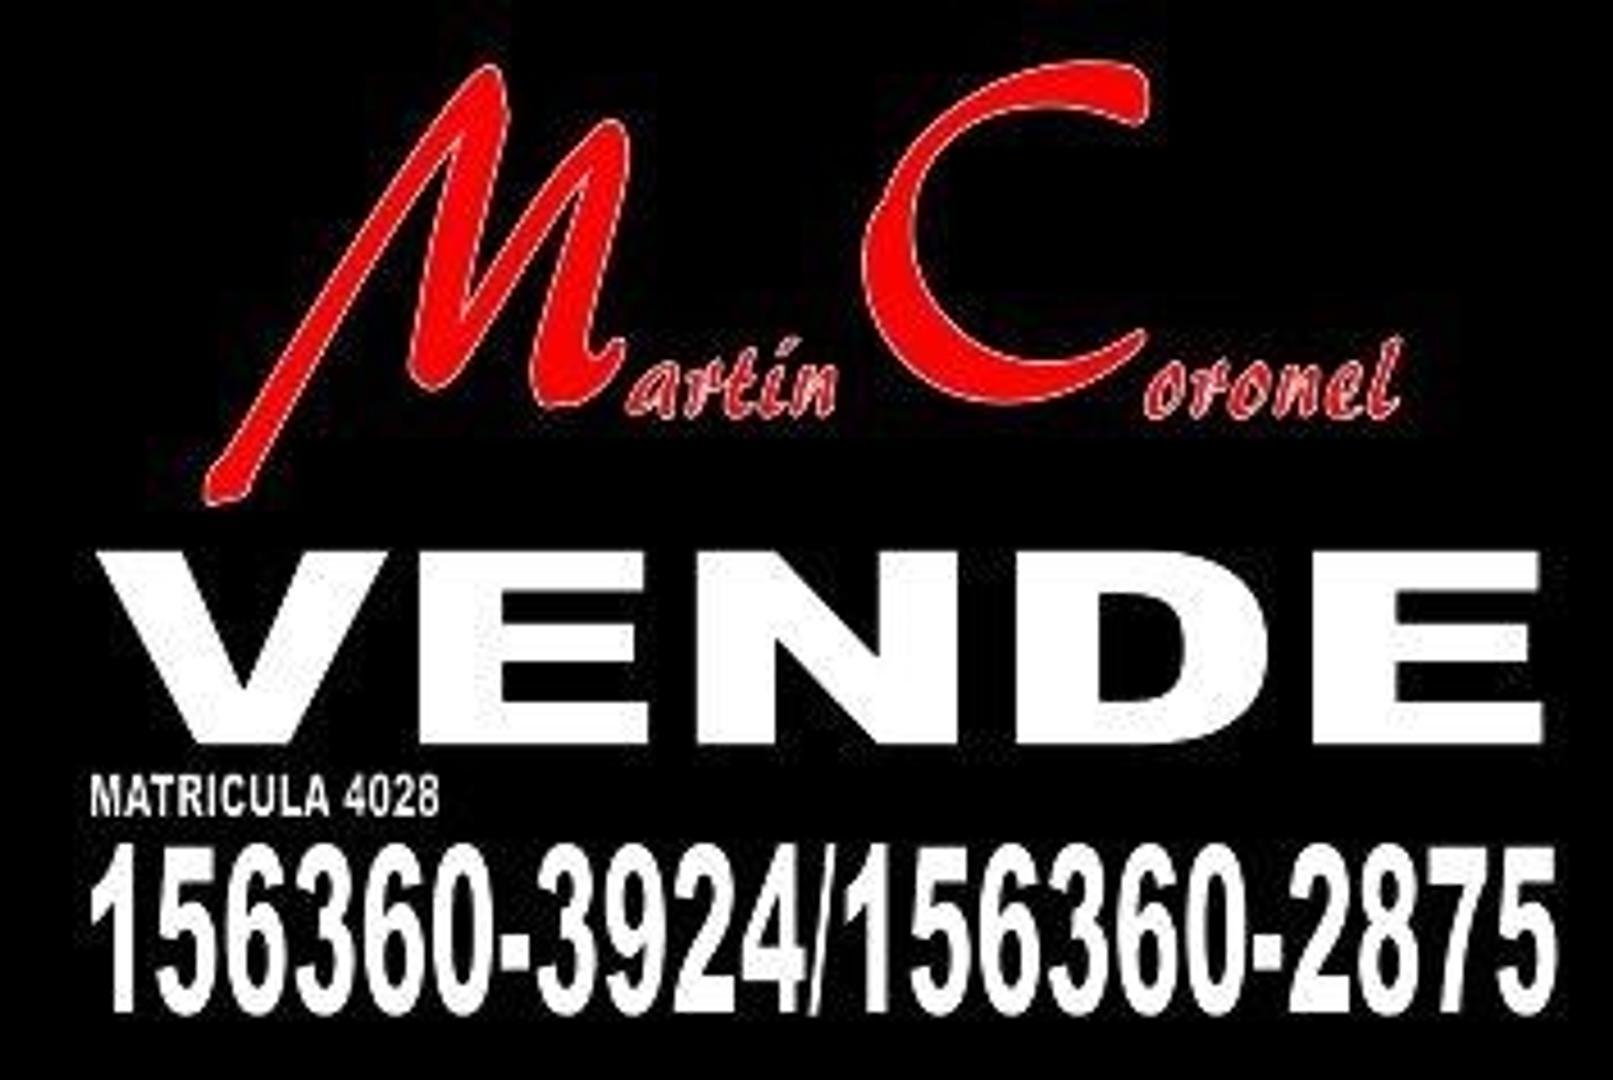 EXCELENTE LOTE EN BARRIO 5° AVENIDA!!!